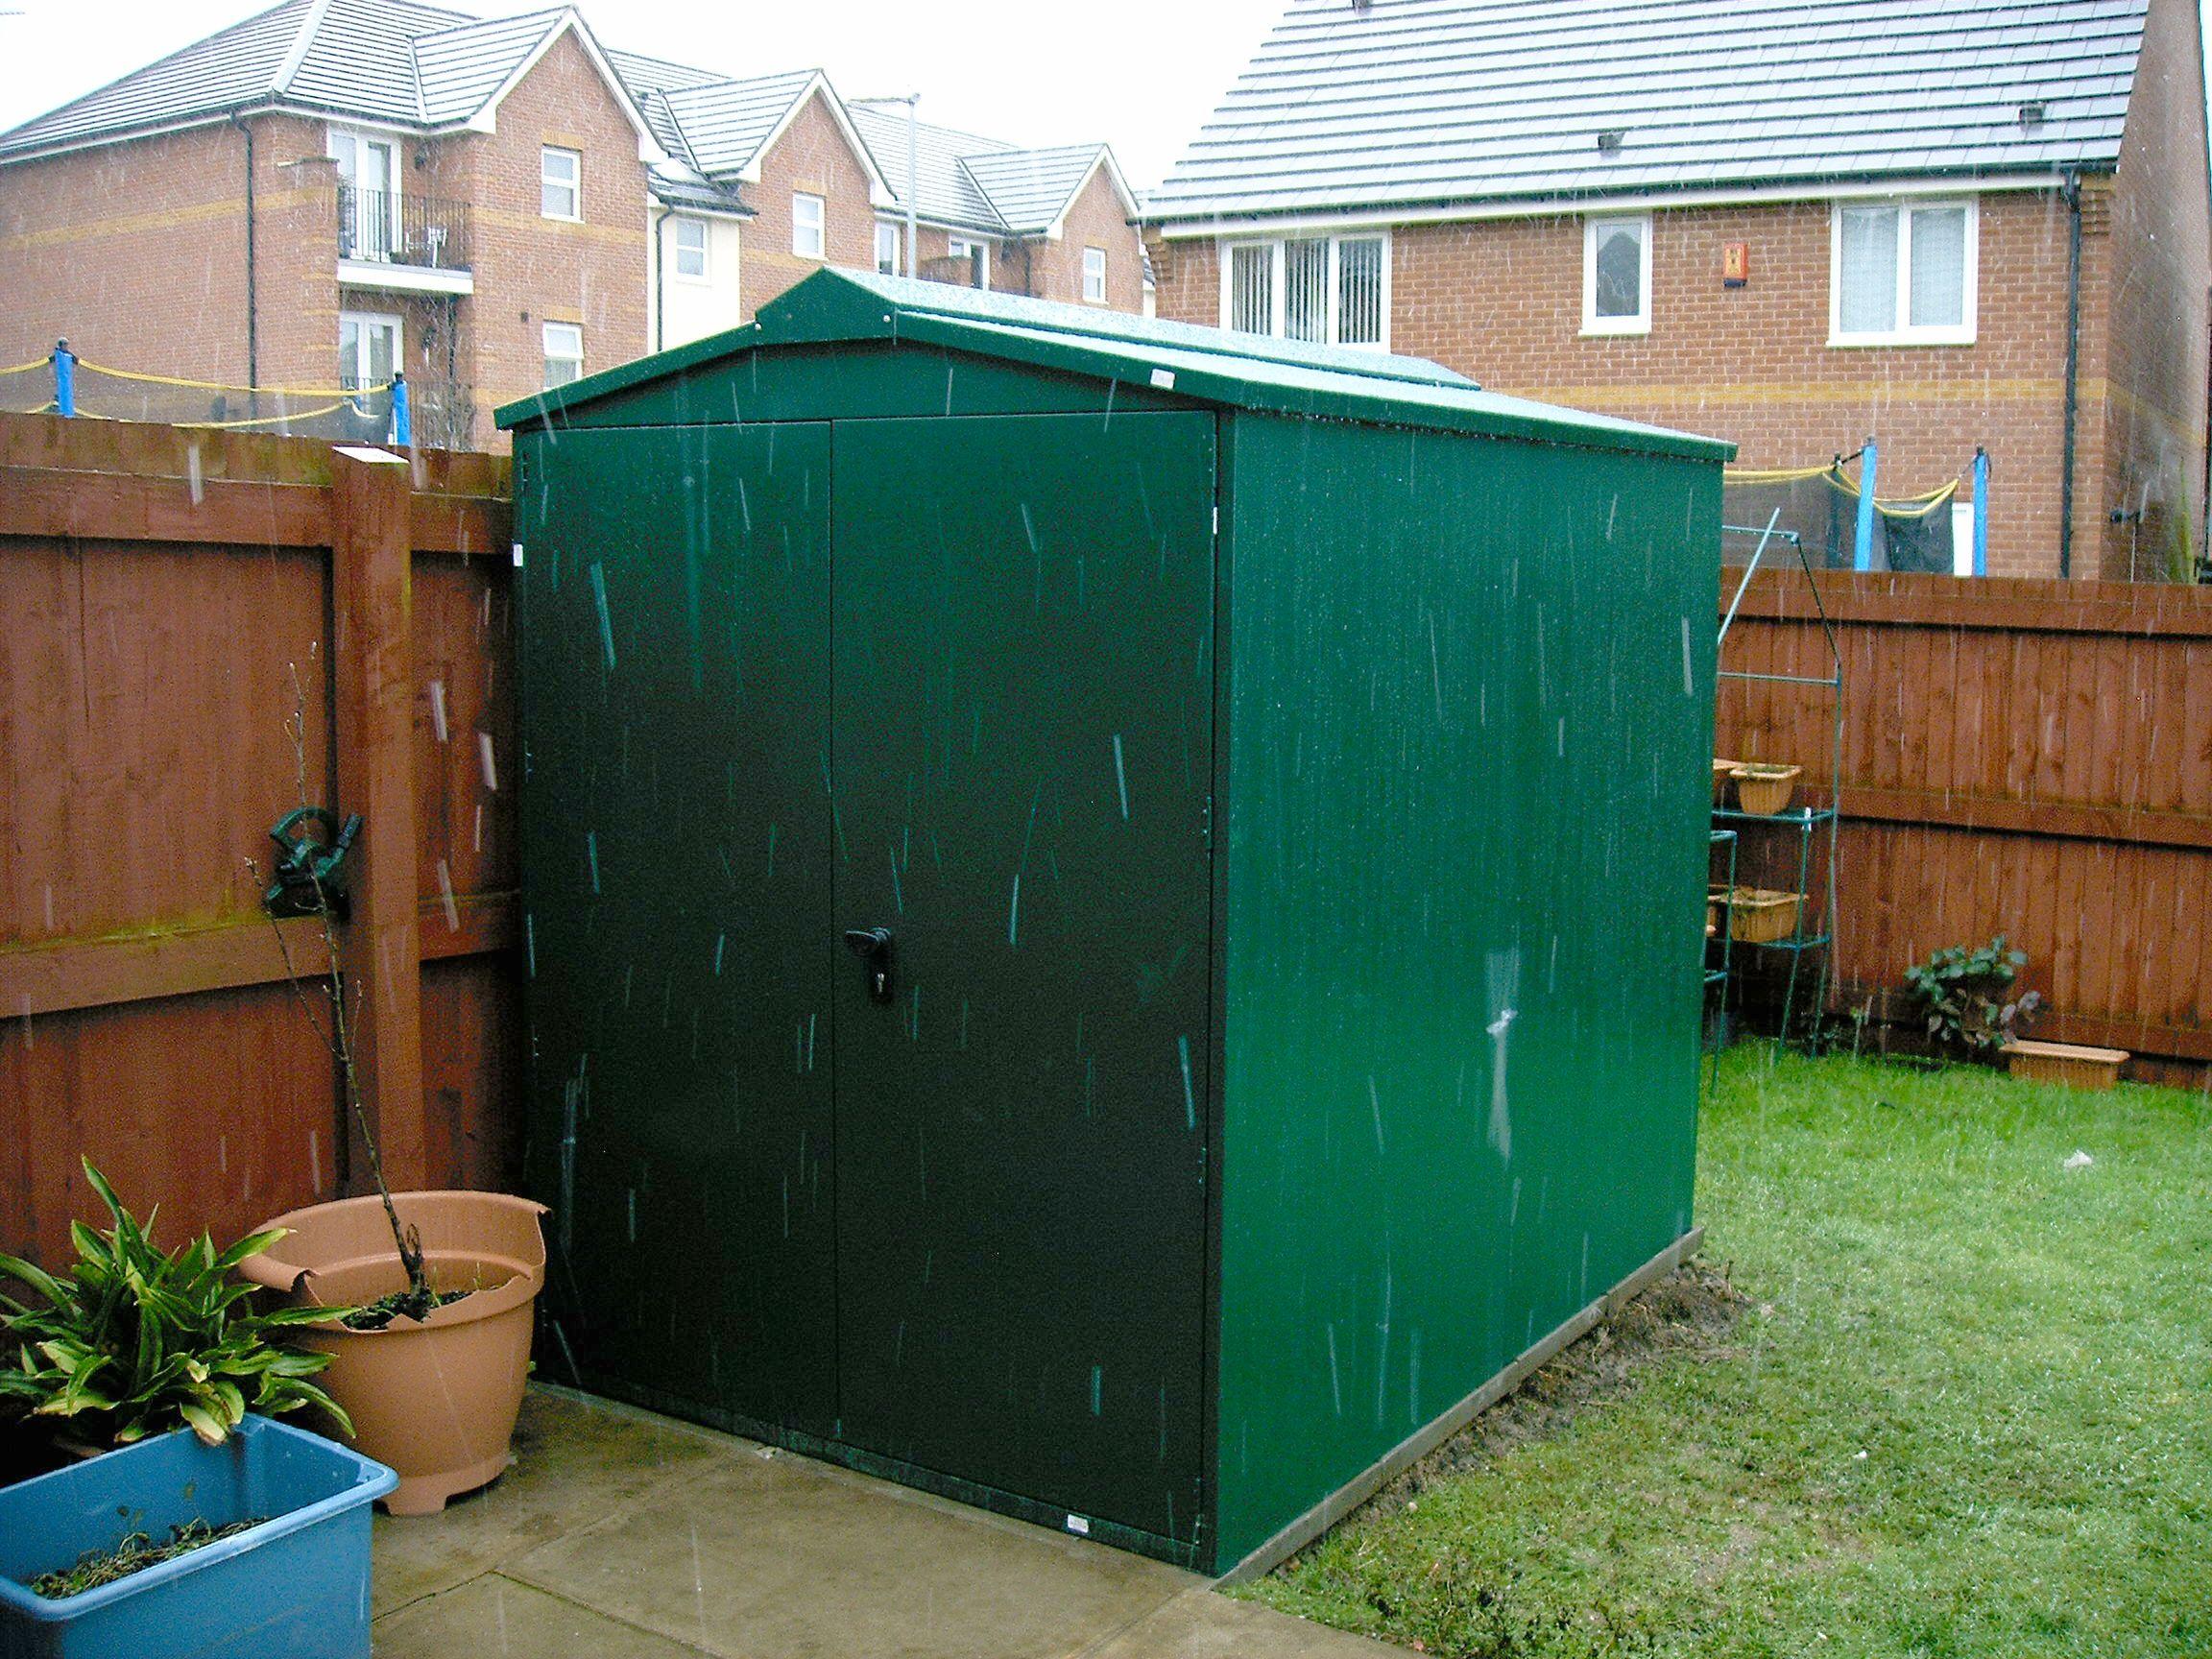 5x7 Centurion Metal Shed Police Approved Garden Storage Shed Garden Shed